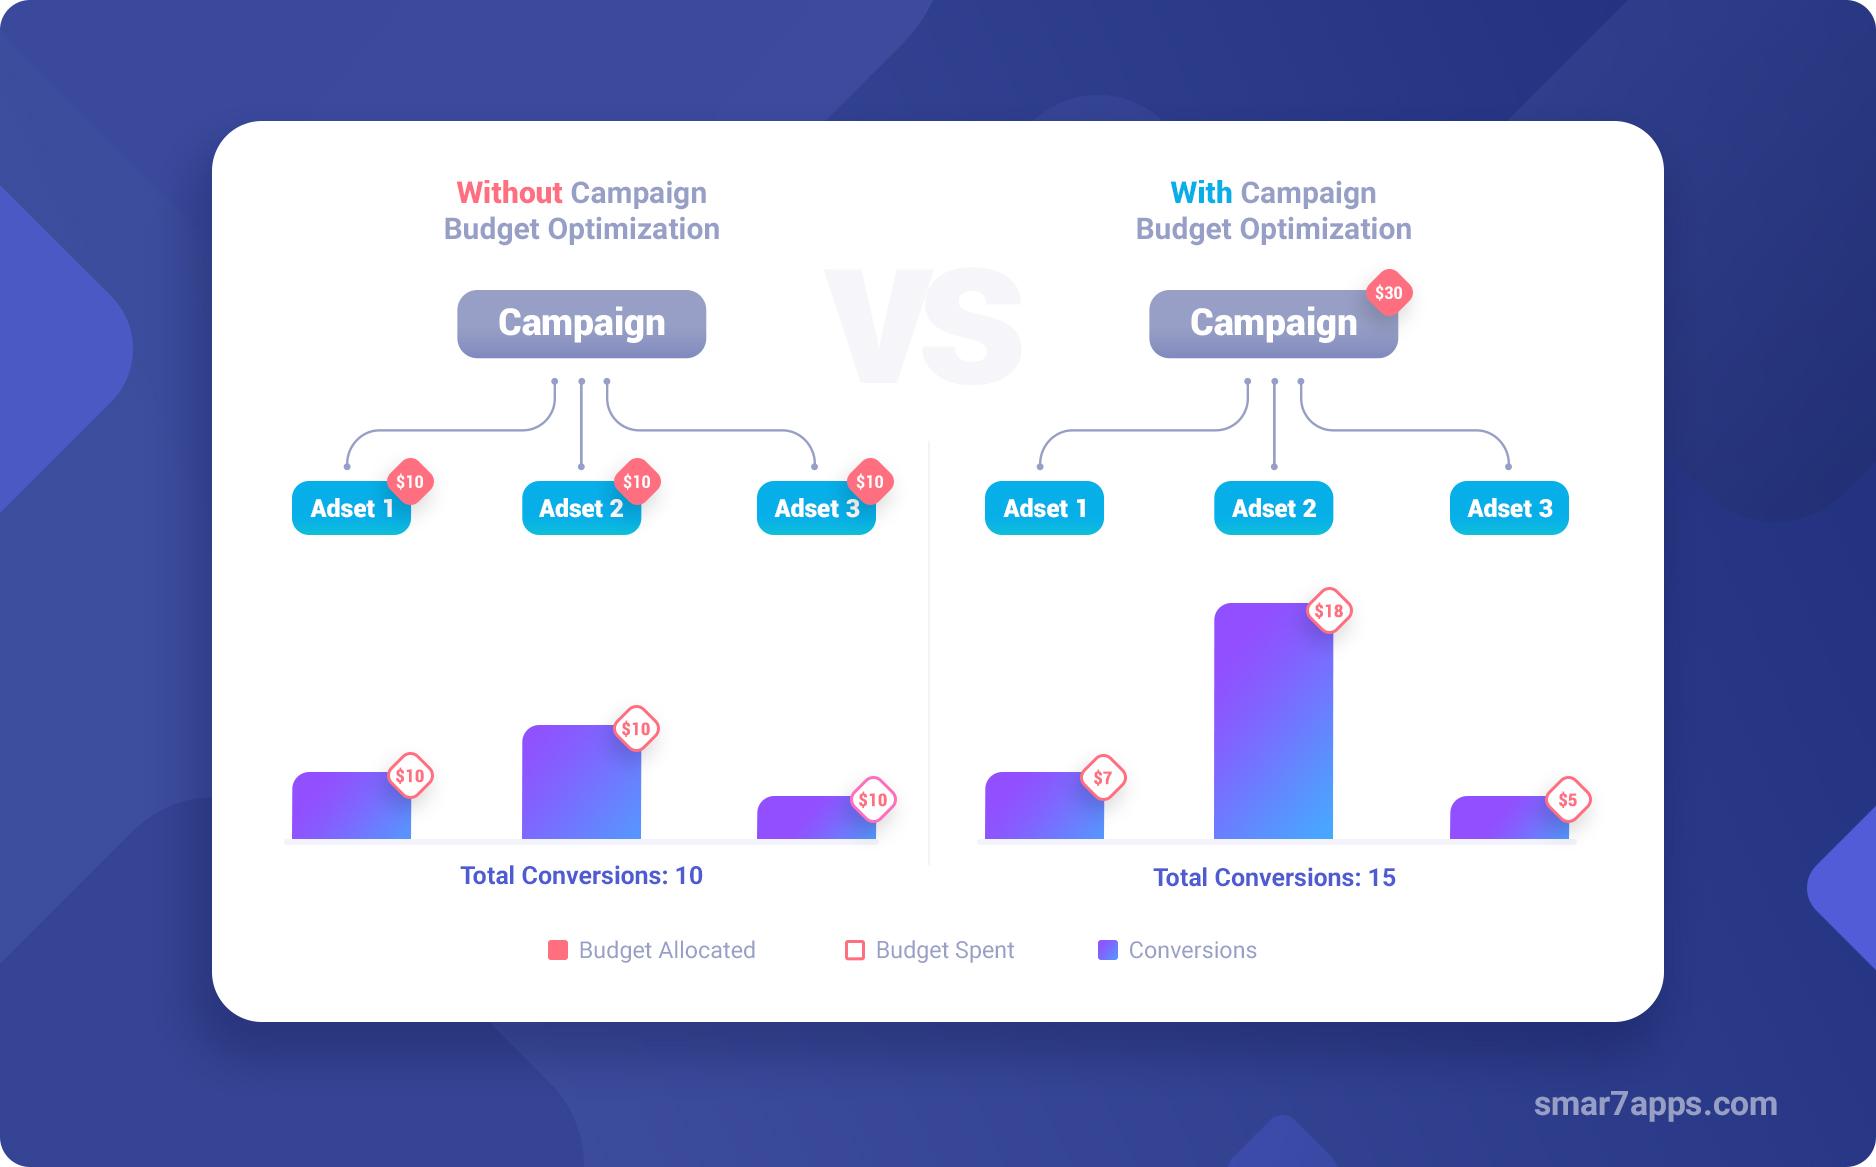 facebook campaign budget optimization september 2019